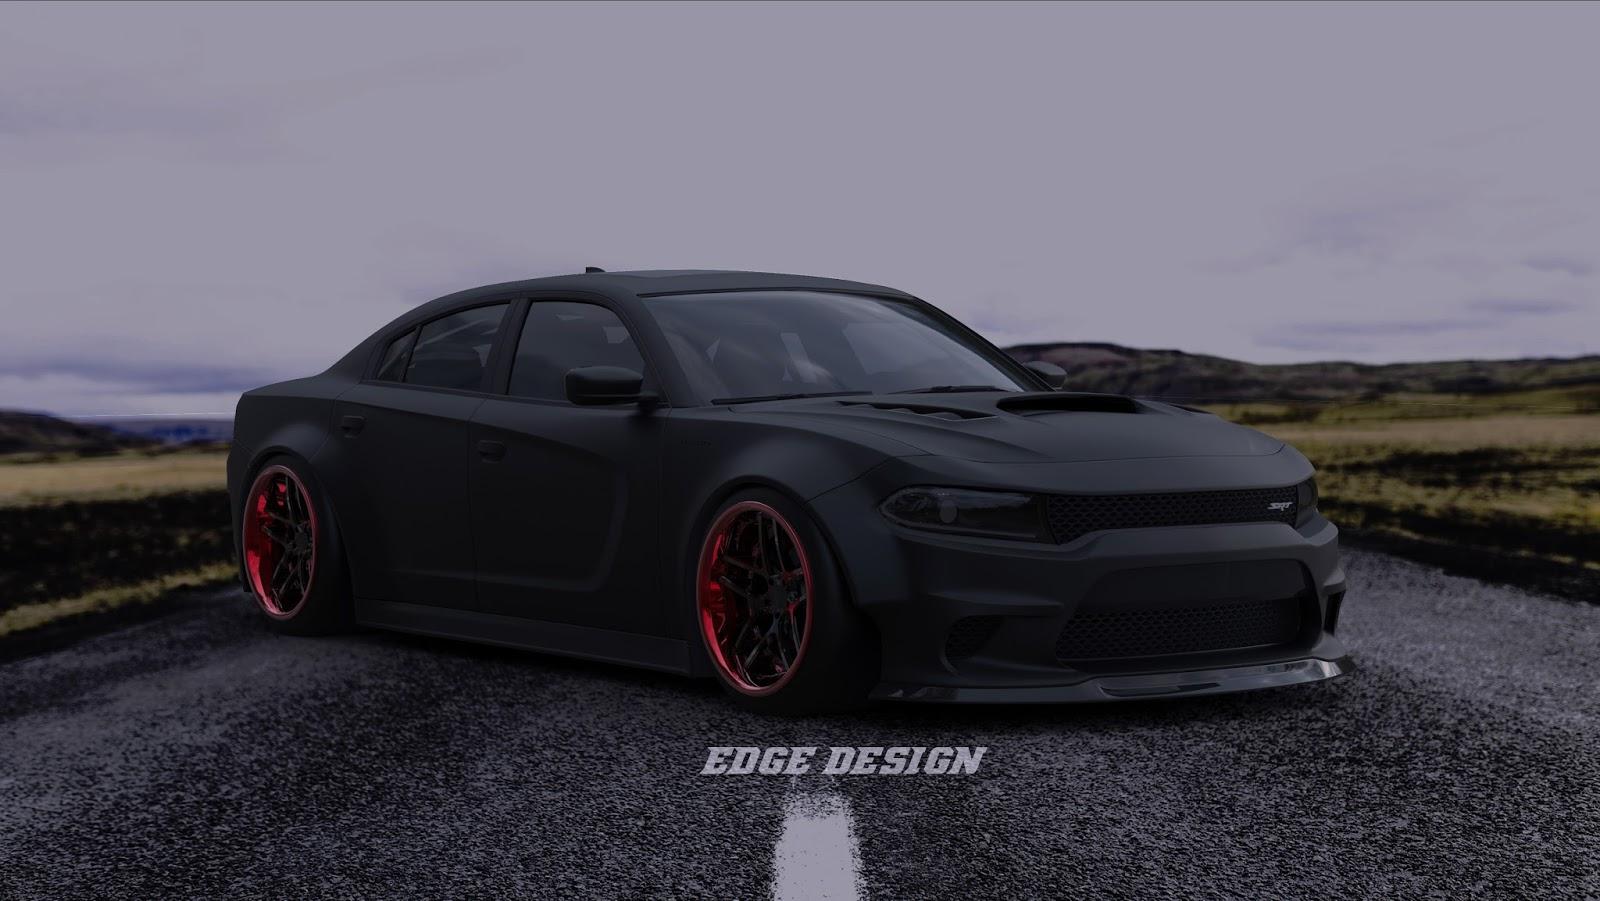 2015 Dodge Charger Srt Hellcat Widebody Kit Design Turbo90 Blog